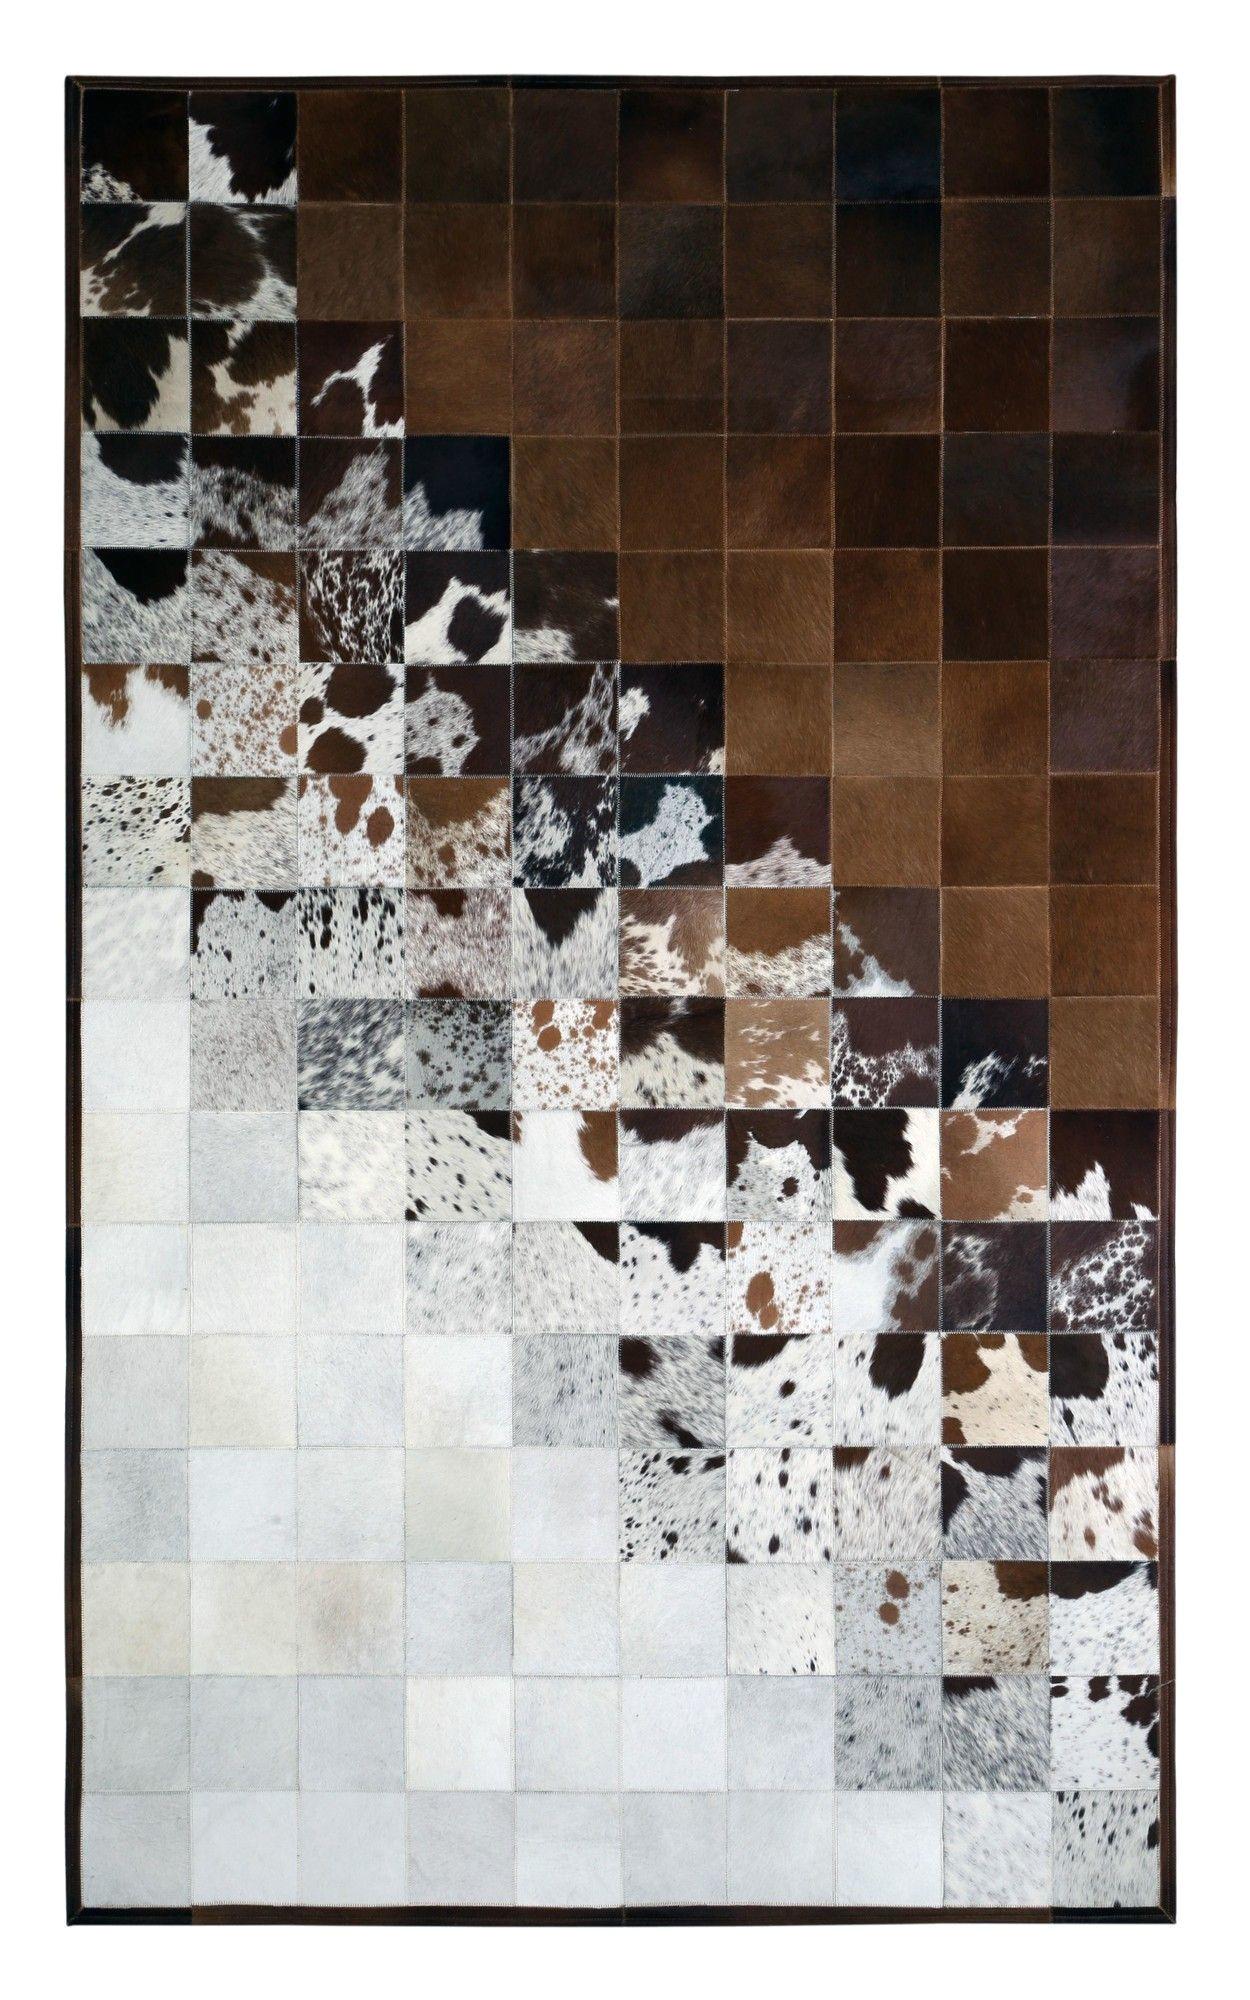 prescott brown natural area rug cow rug cow hide rug carpet tiles